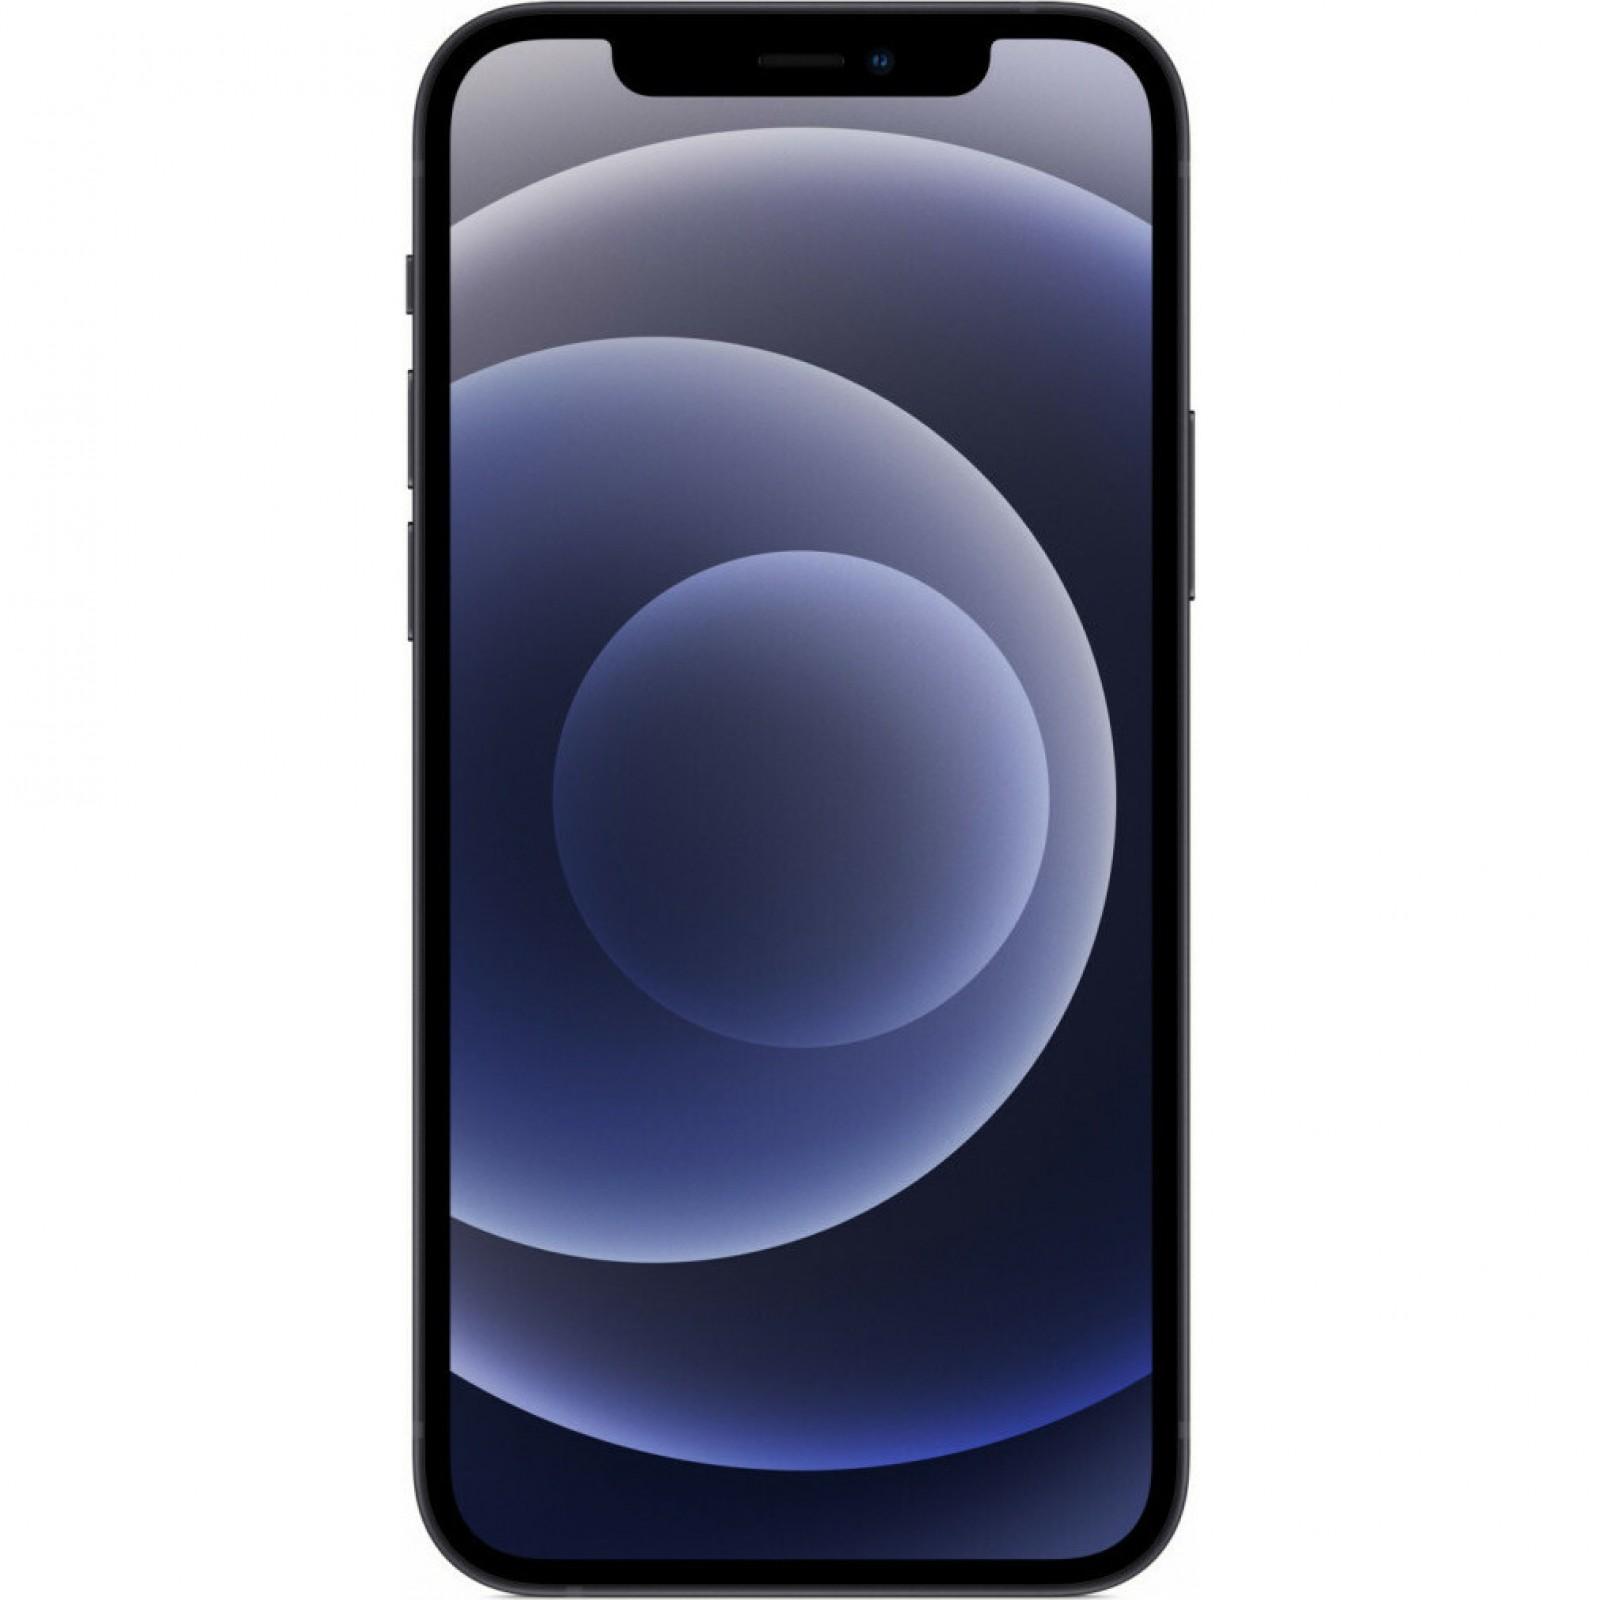 Apple iPhone 12 (64GB) Black